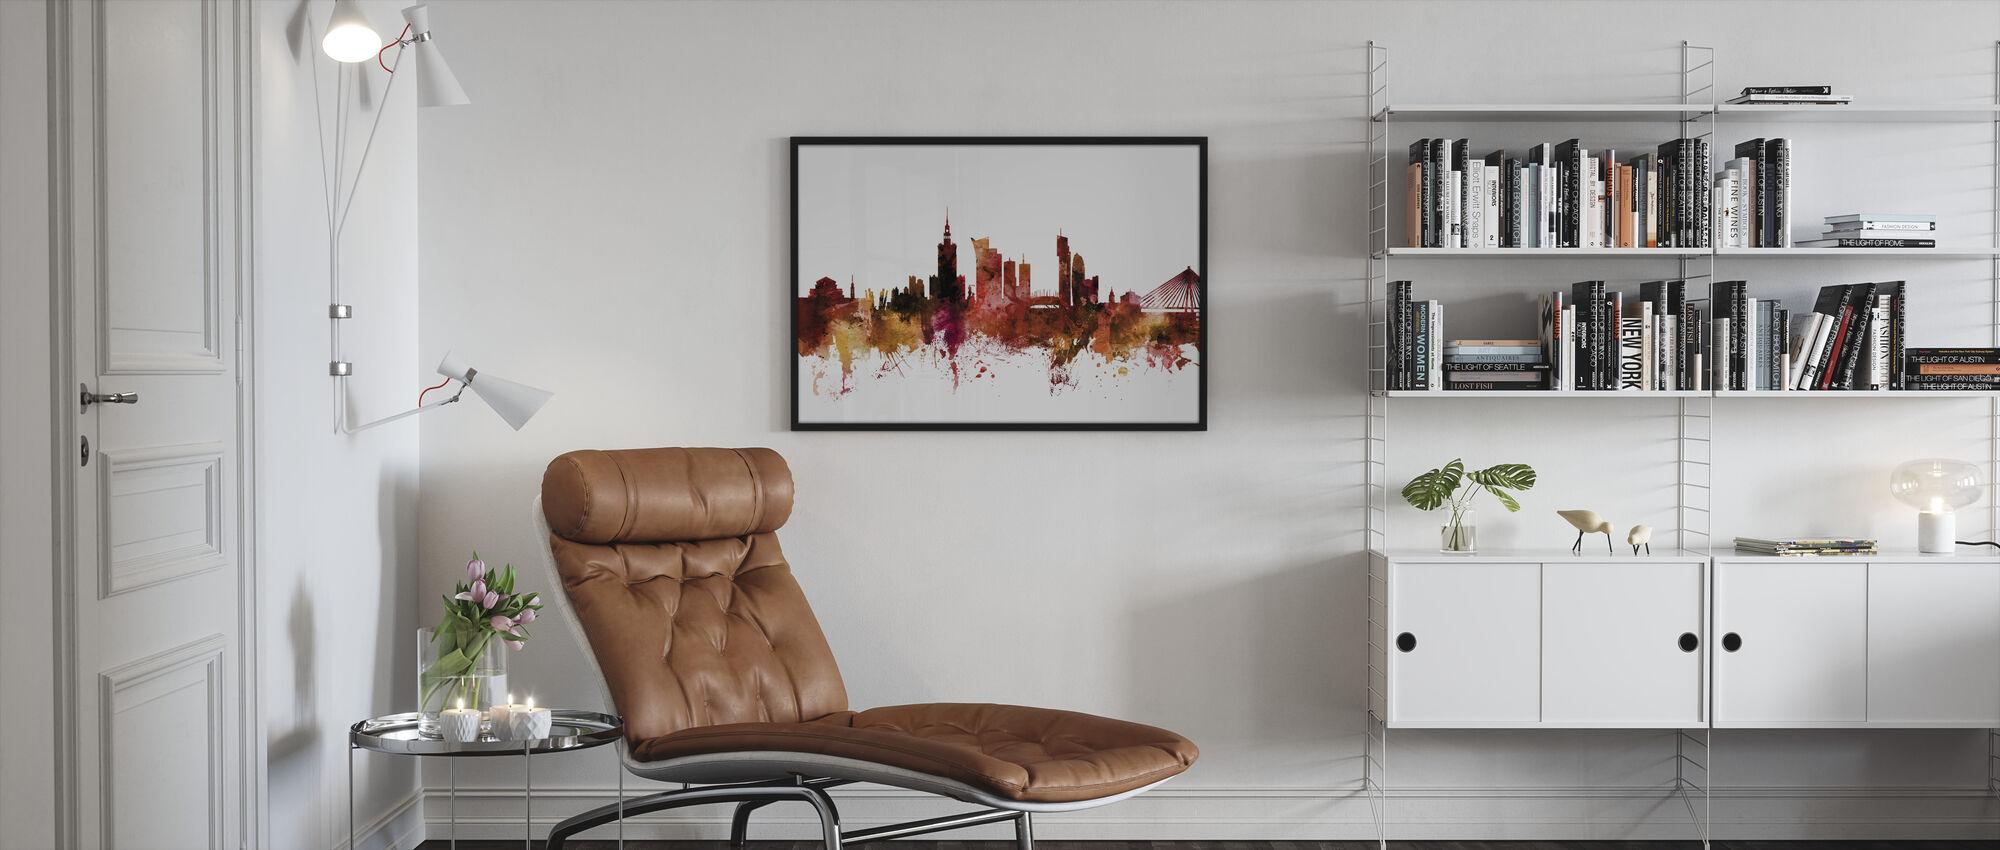 Warsaw Poland Skyline - Framed print - Living Room